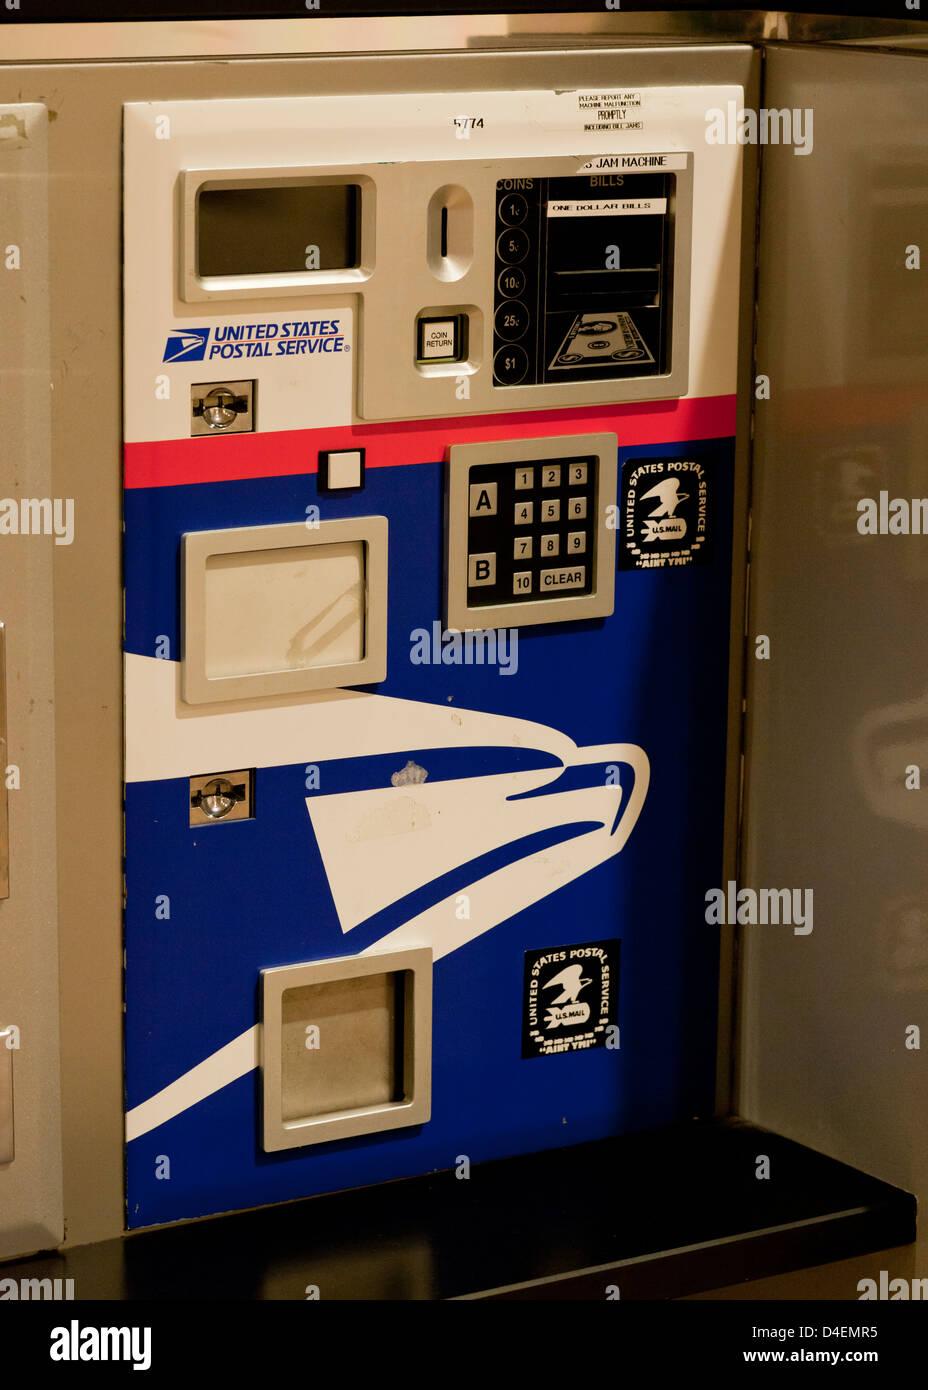 USPS stamp machine - Stock Image